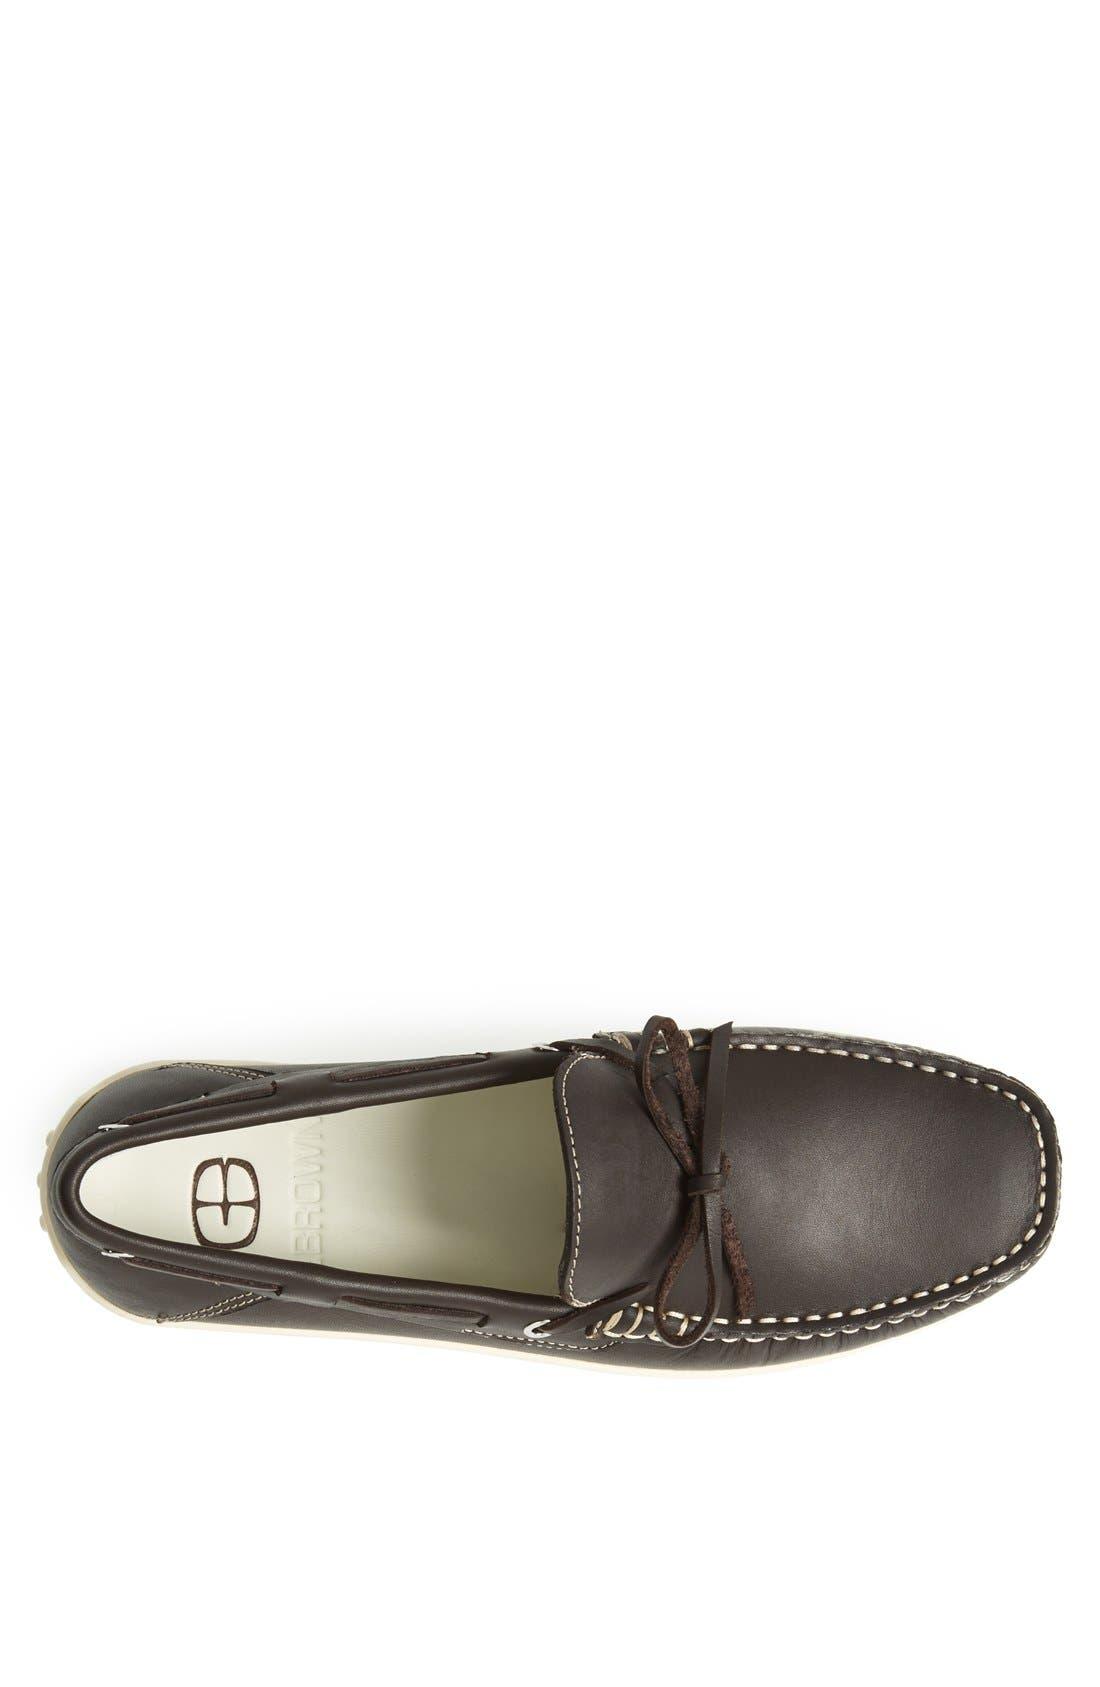 'Bonaire' Driving Shoe,                             Alternate thumbnail 3, color,                             Dark Brown